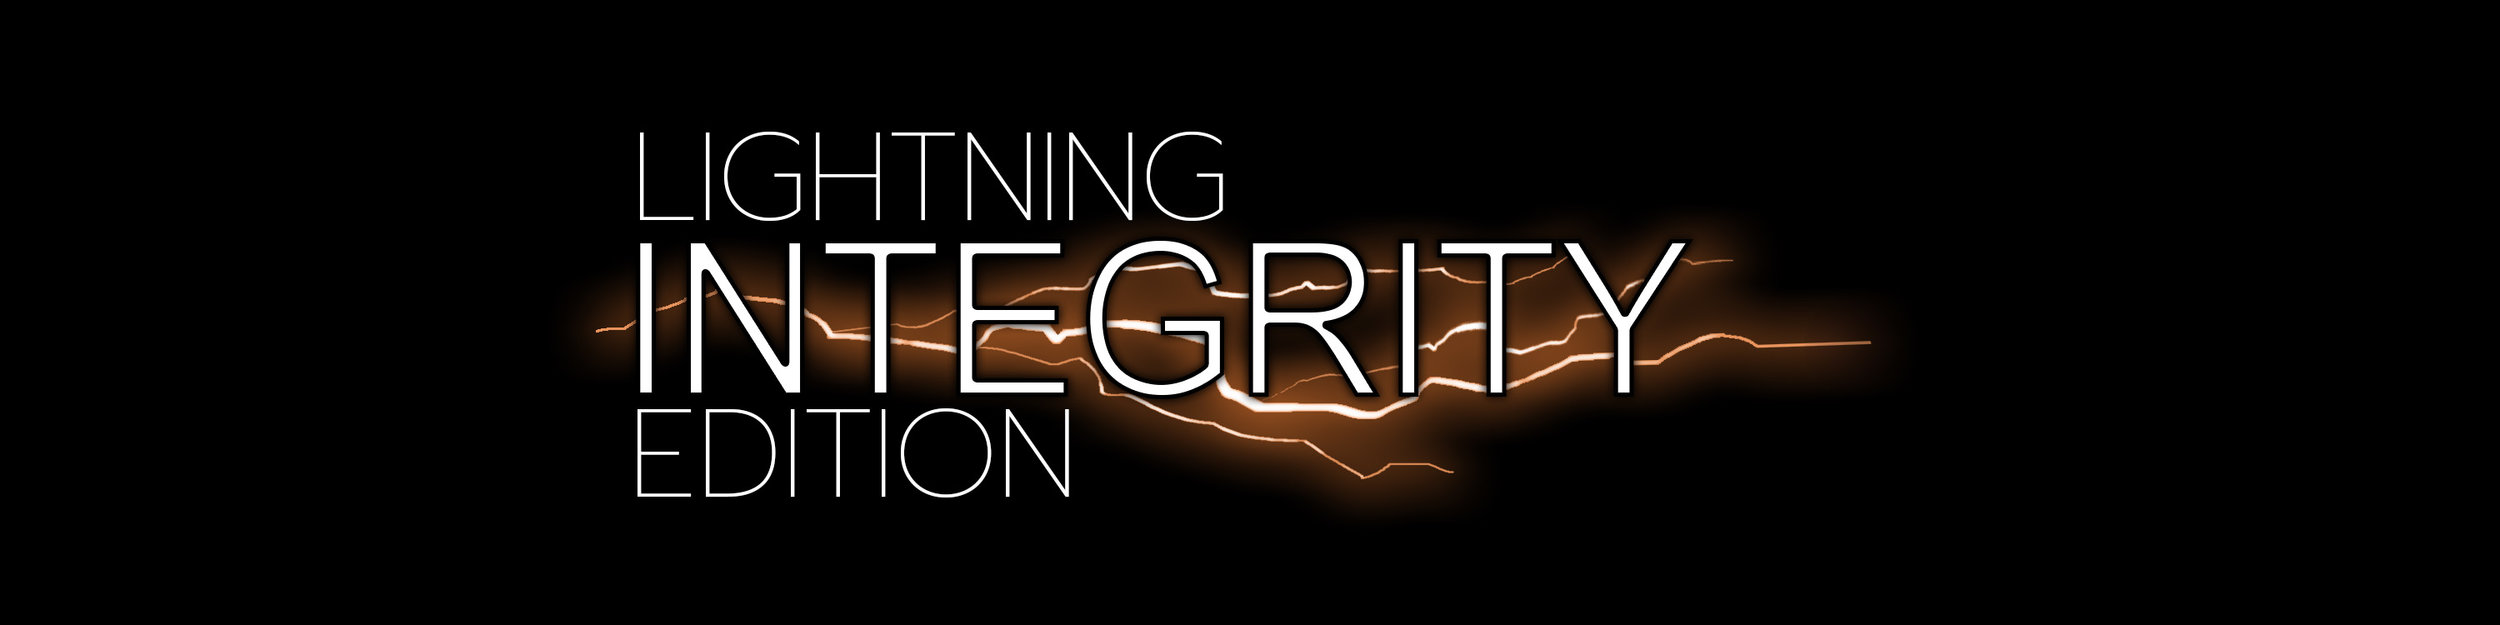 lightning integrity automation sheet generation arc